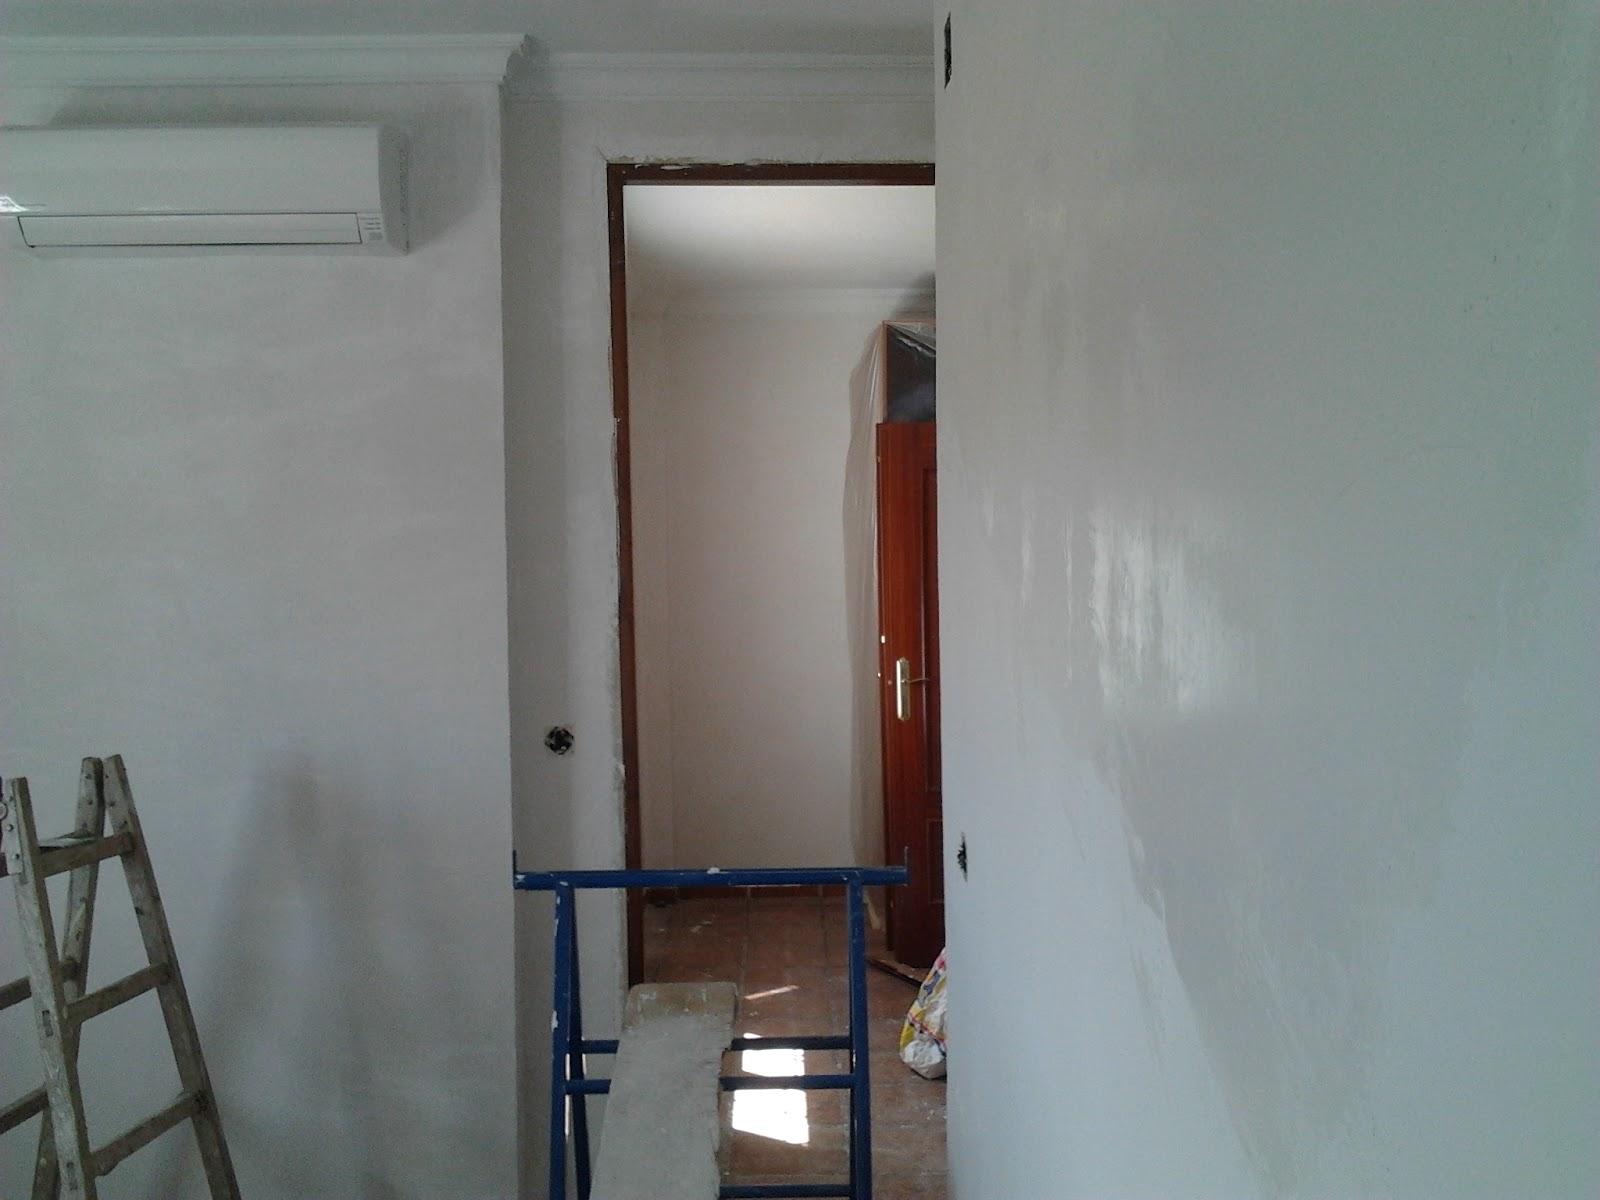 Ernesto arag n pintura para el hogar adi s al gotel - Alisar paredes gotele pintura plastica ...